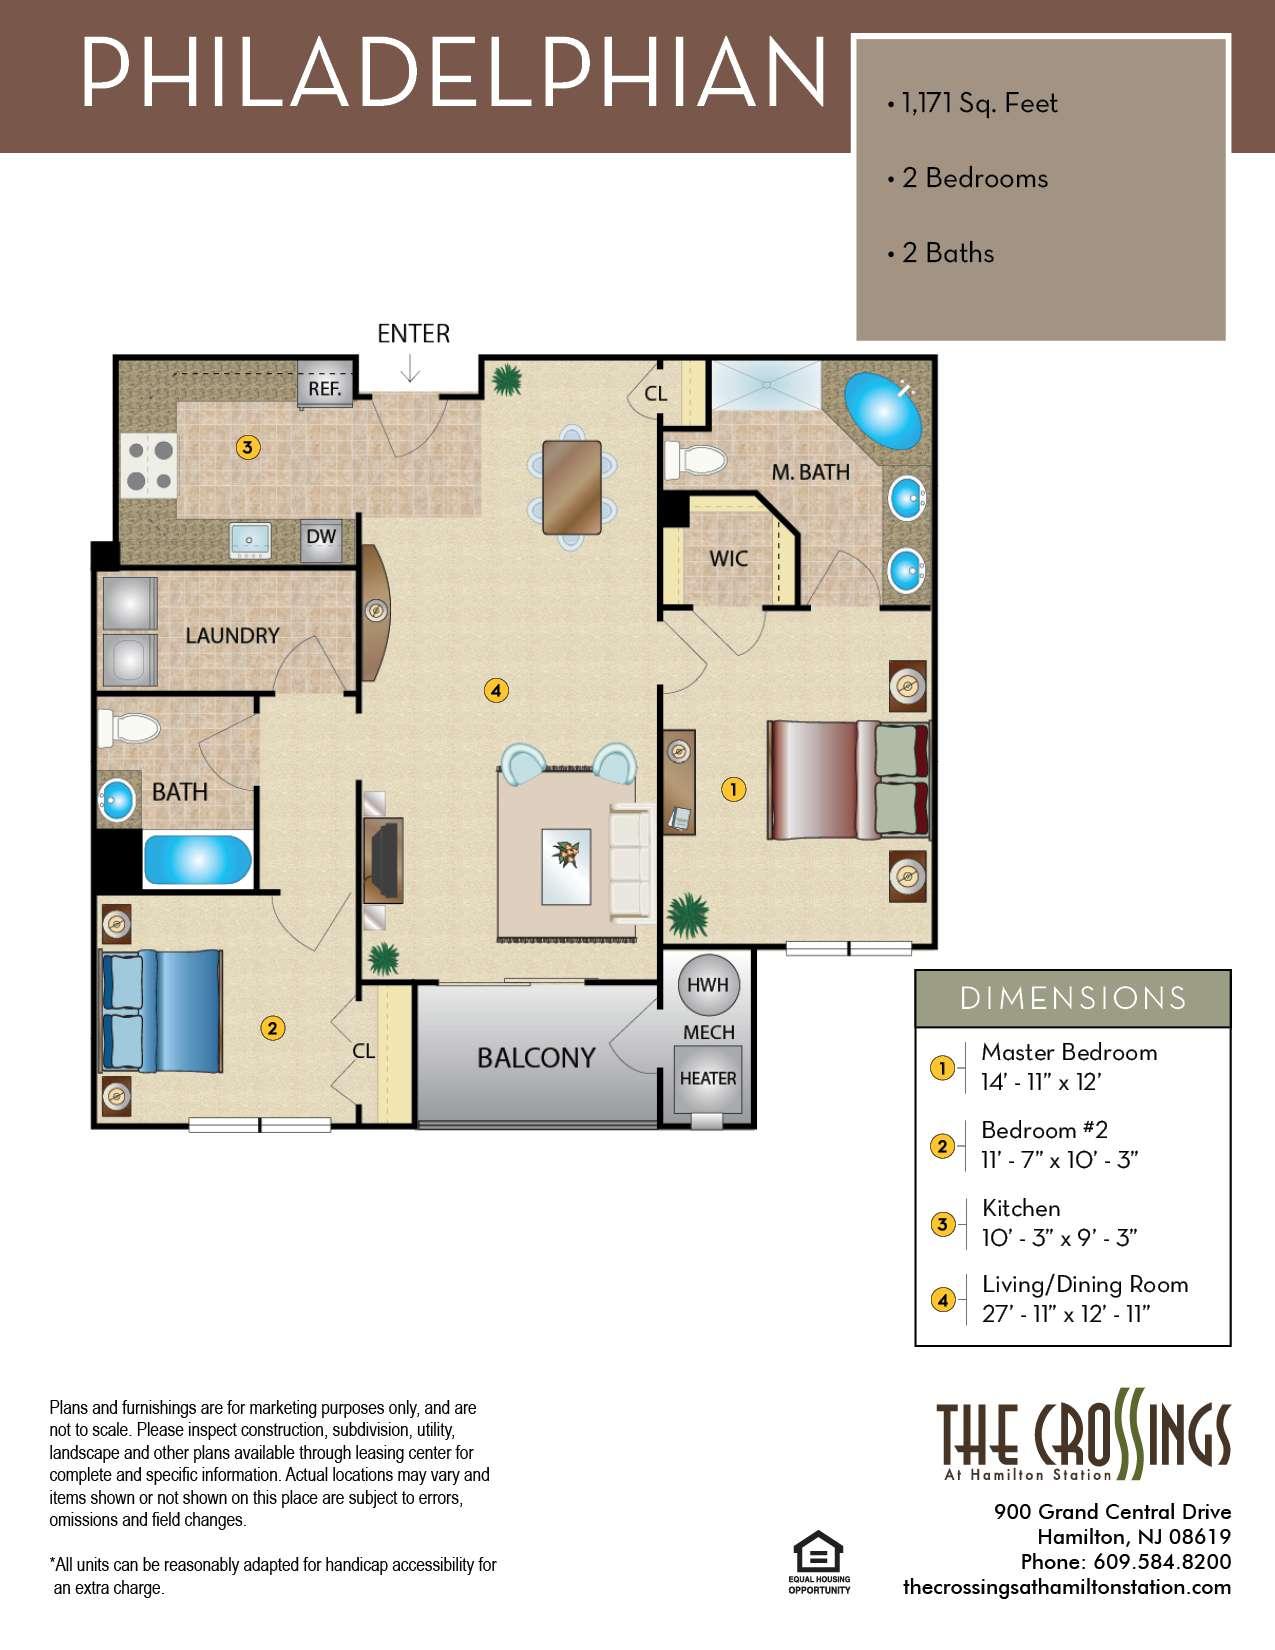 The Philadelphian Floor Plan